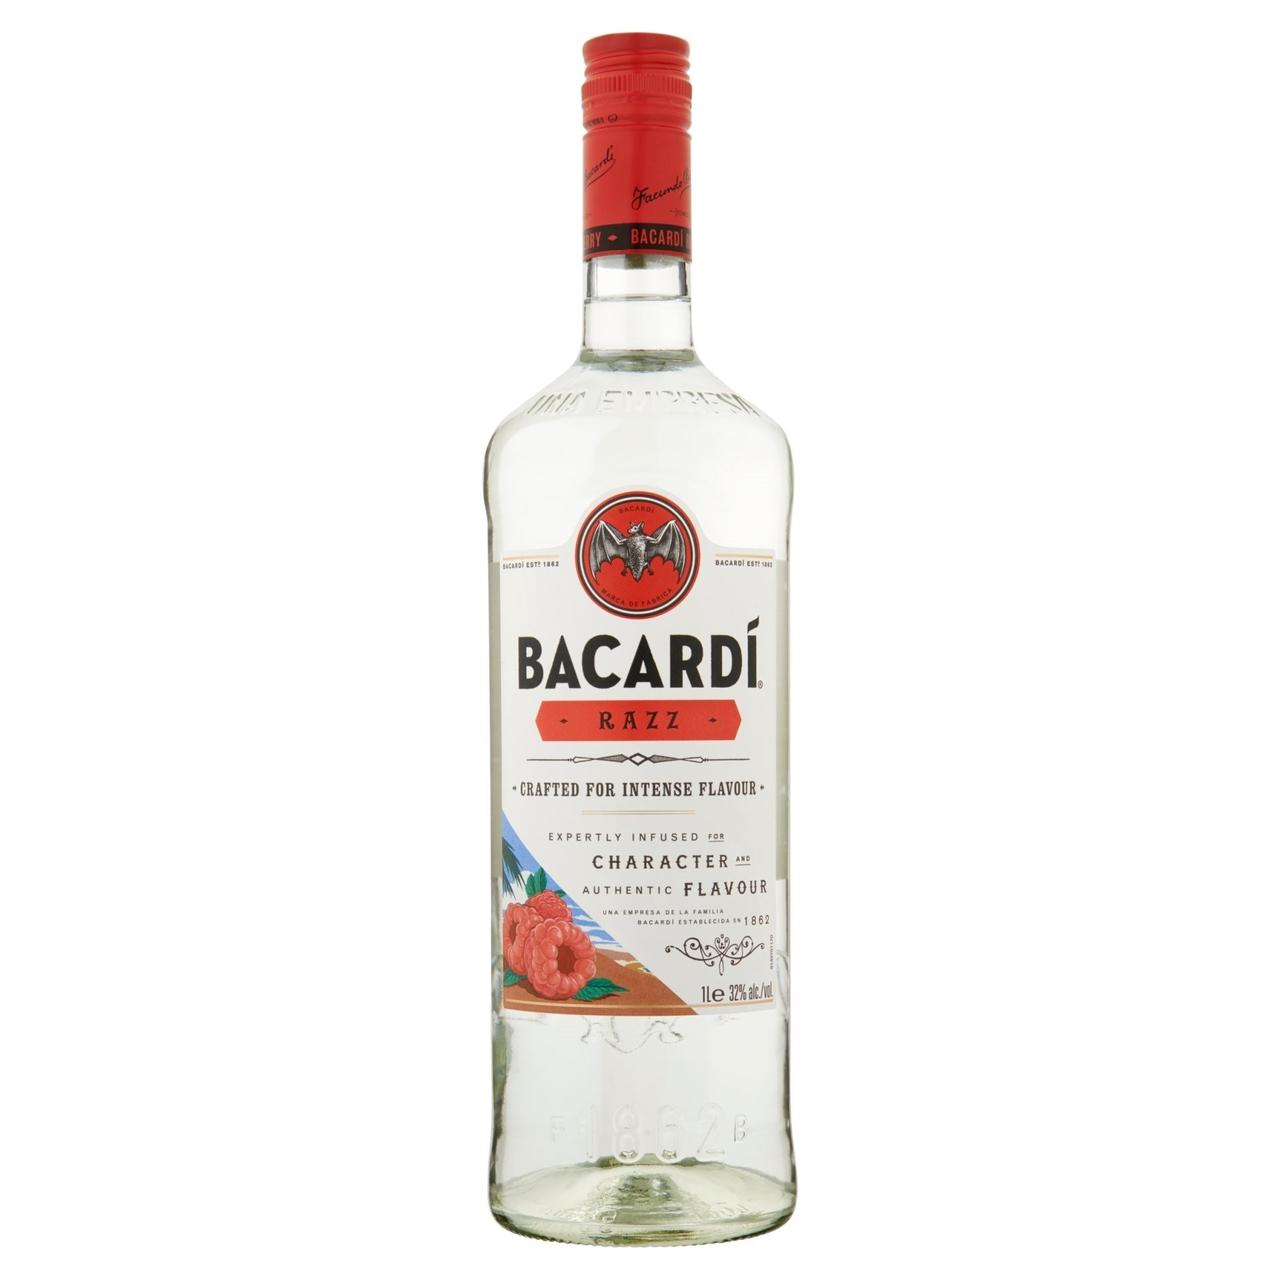 bacardi aanbieding 1 5 liter